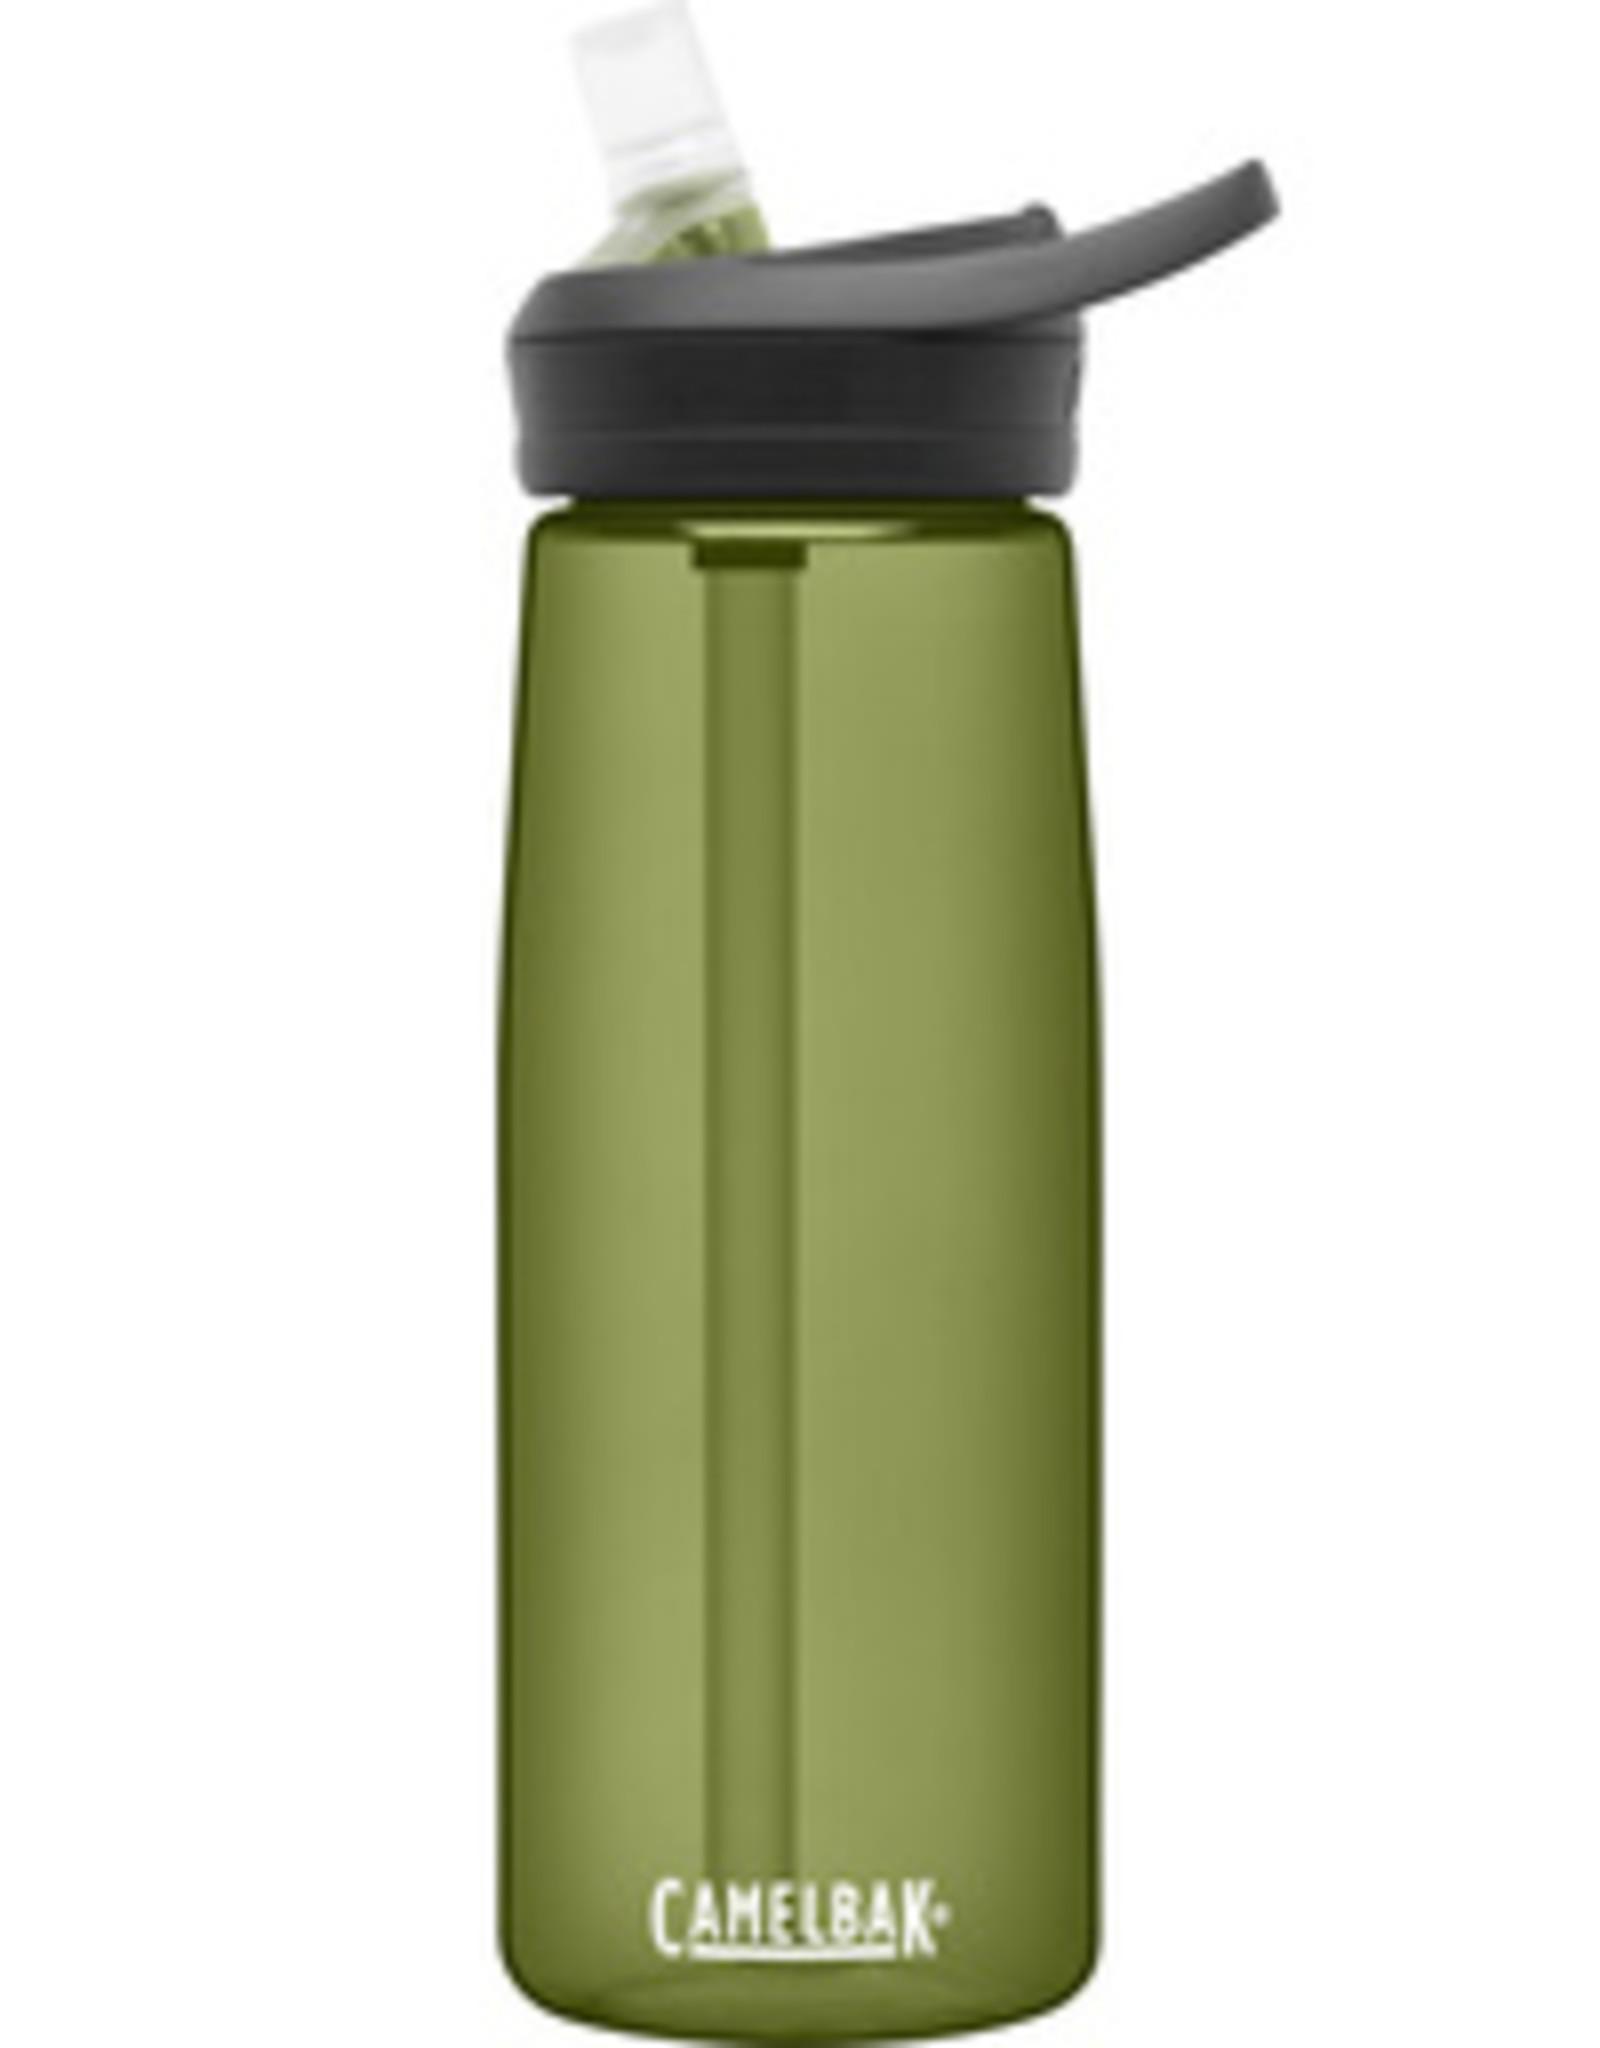 Camelbak Camelbak Eddy+ 25oz Bottle